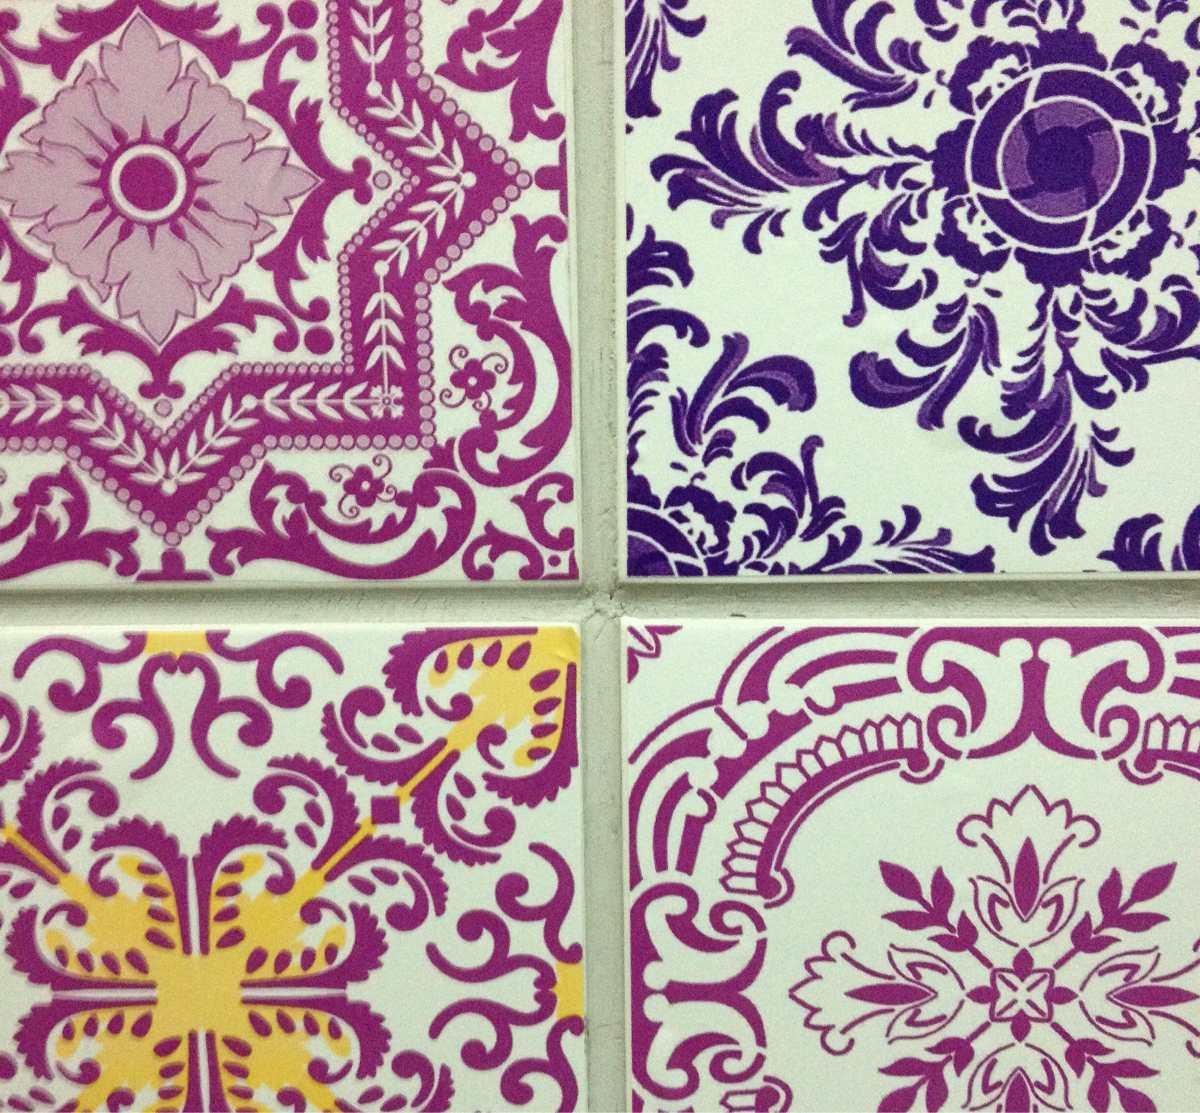 10 adesivo azulejo portugu s ladrilho hidr ulico 15x15 cm - Azulejo 15x15 ...